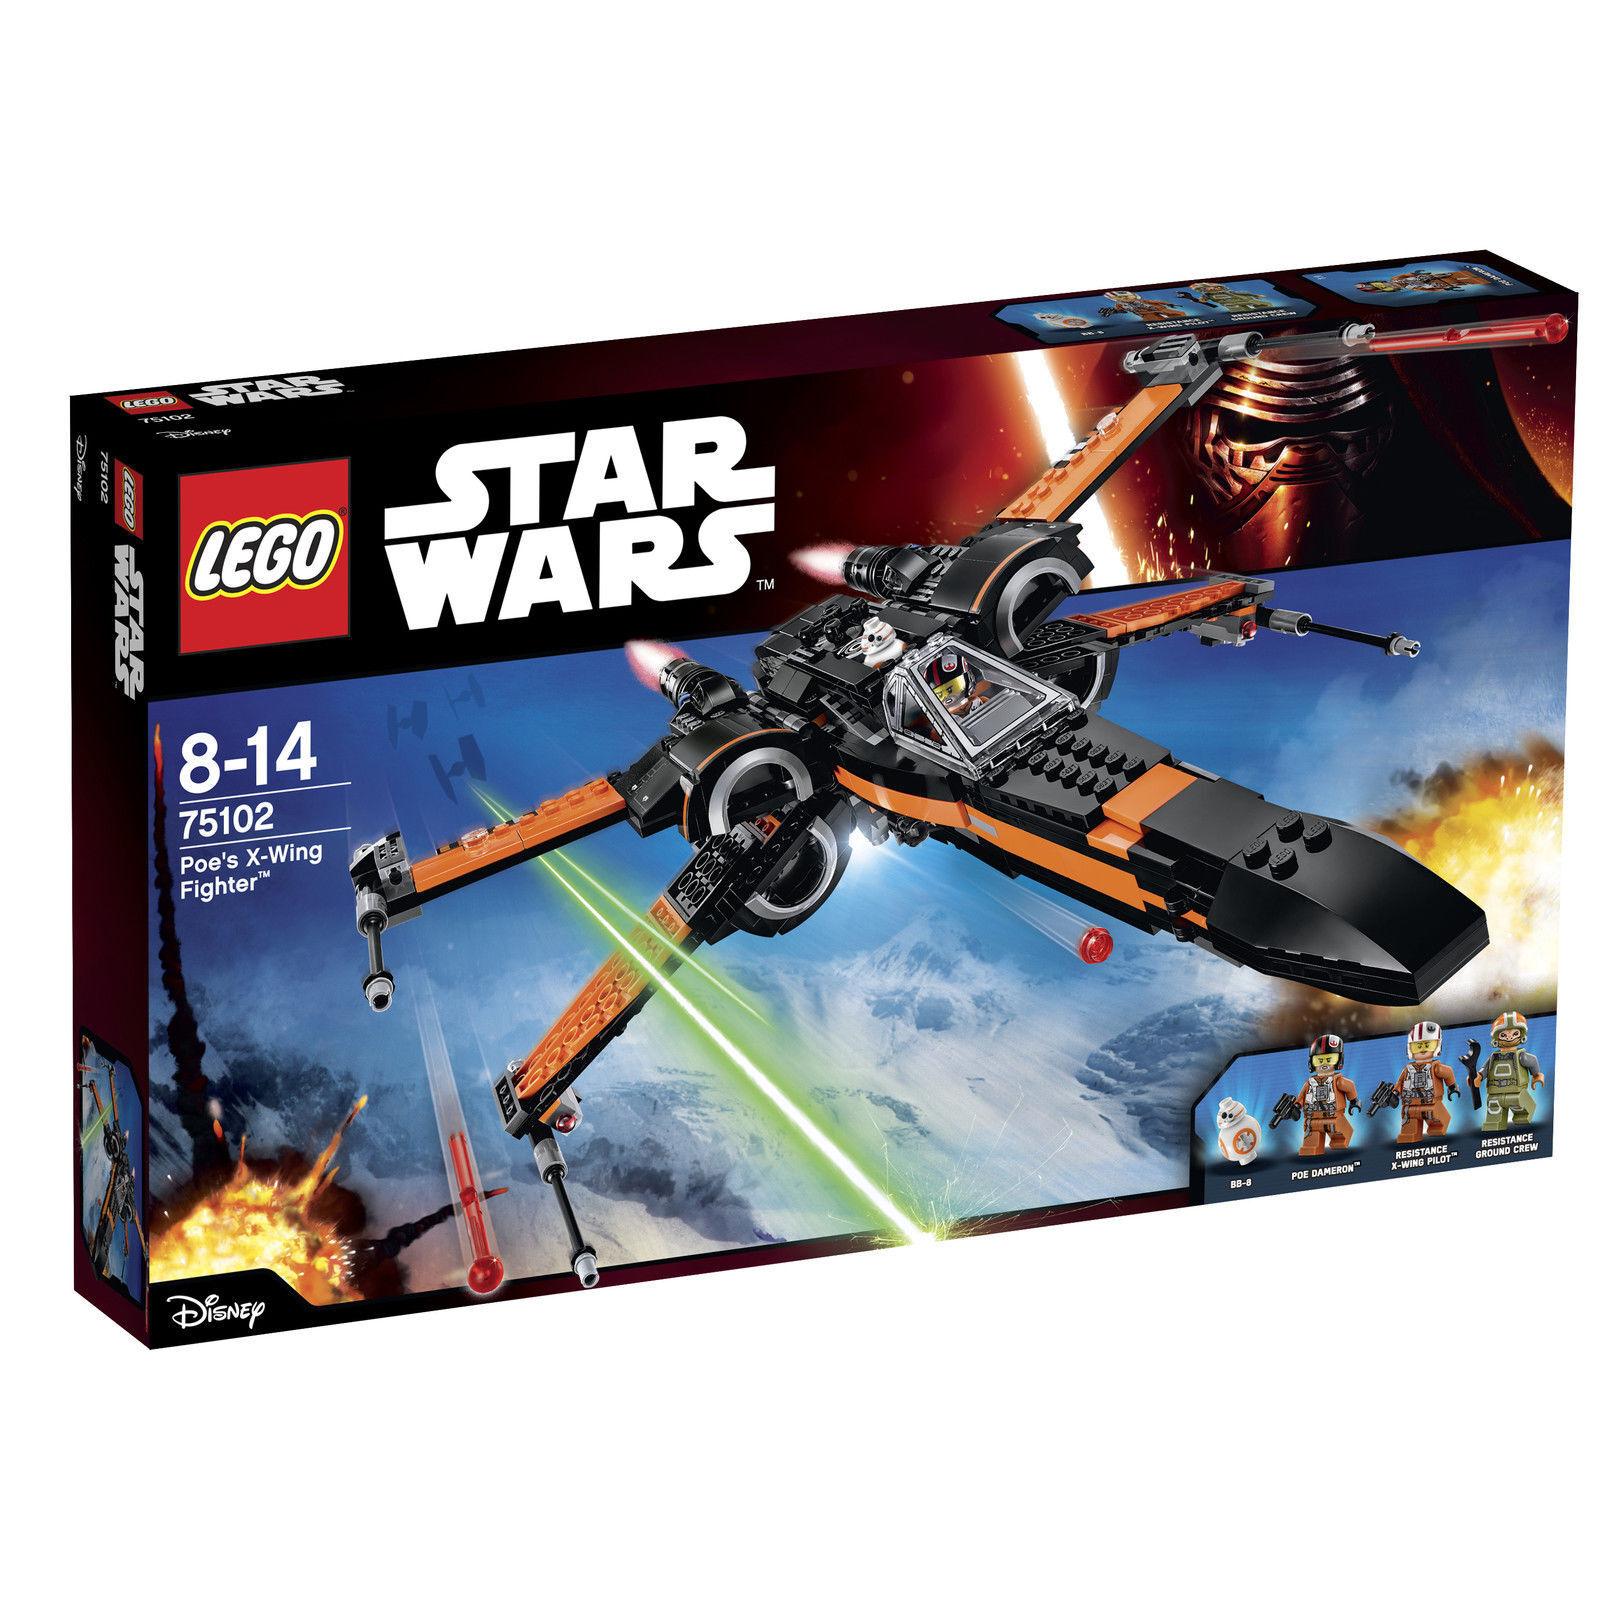 LEGO StarWars 75102 Poe's X-Wing Fighter ; NEU + OVP